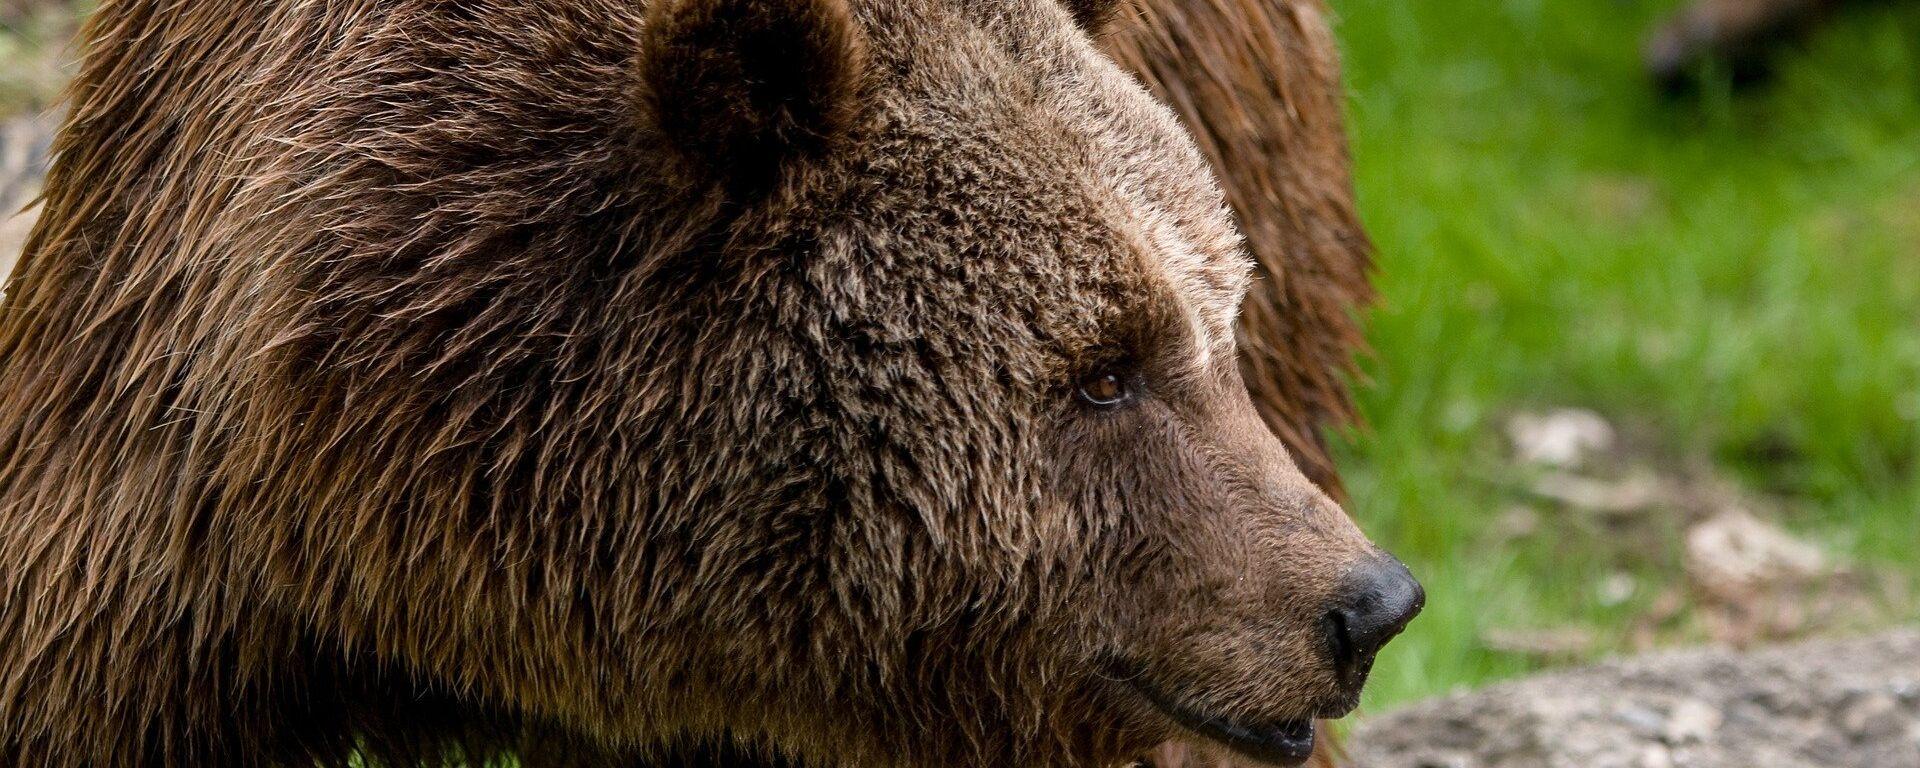 Бурый медведь, архивное фото - Sputnik Беларусь, 1920, 19.05.2021